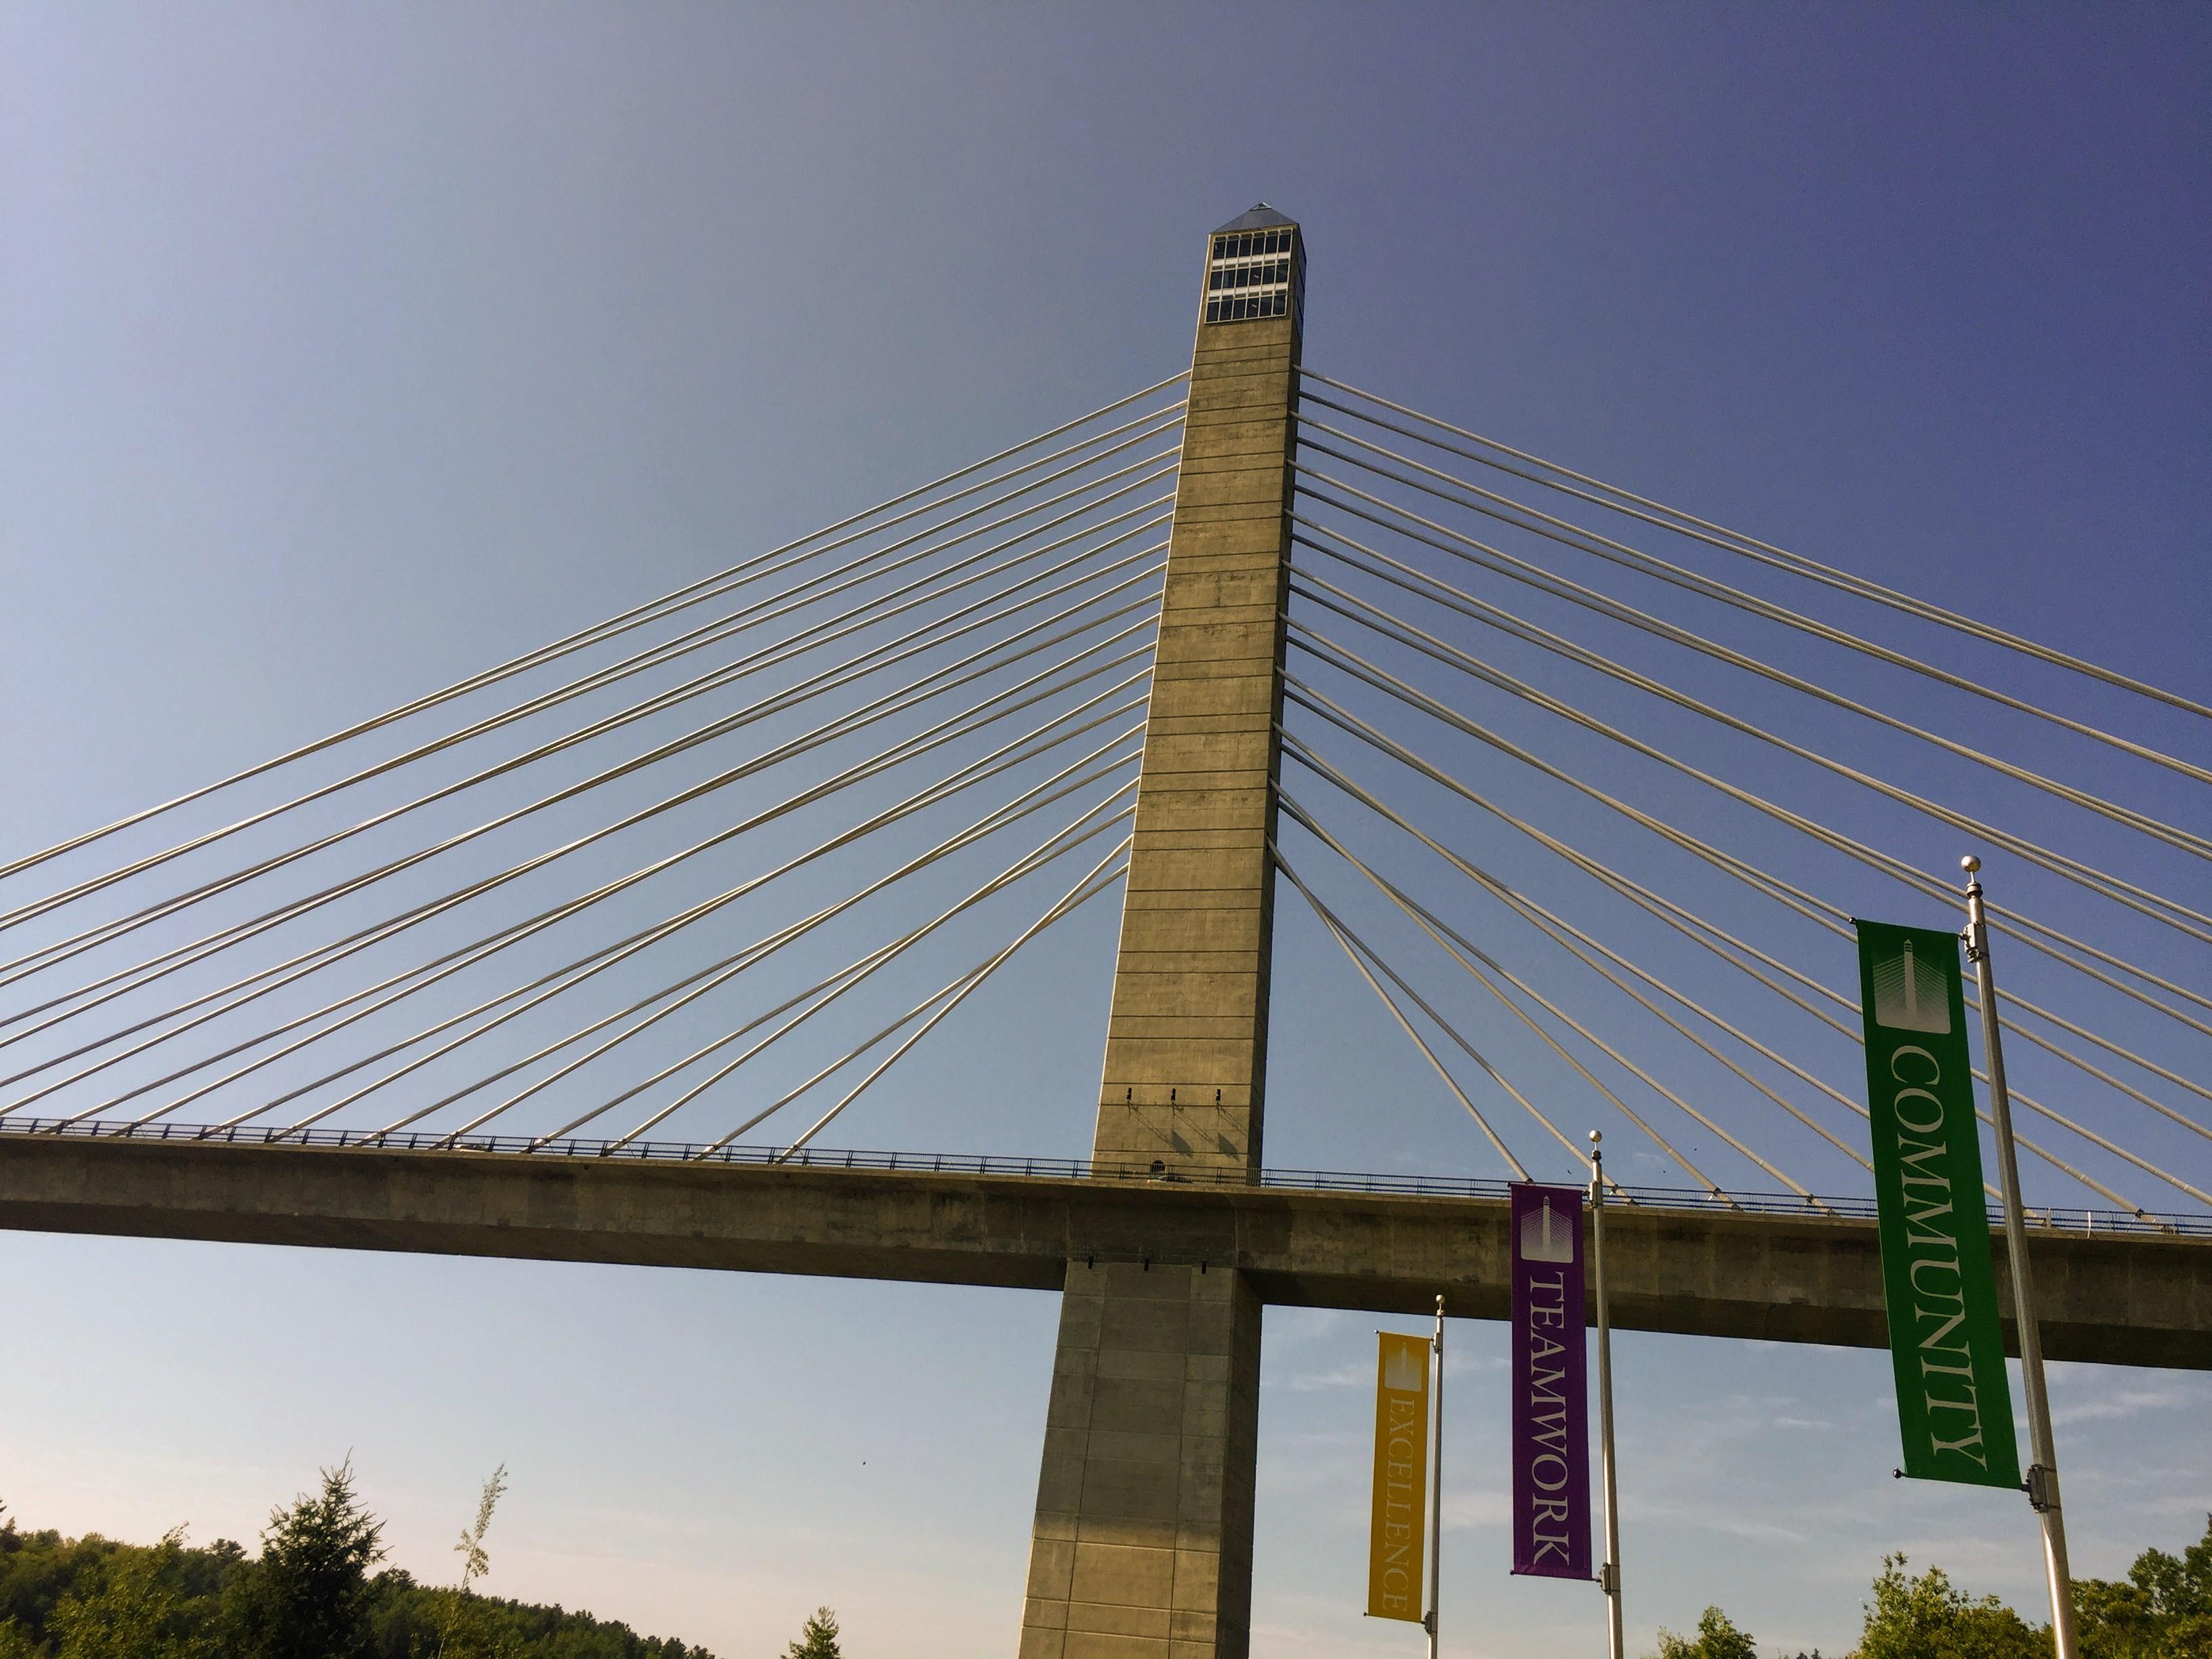 2017-07-22 Penobscot Narrows Bridge 03